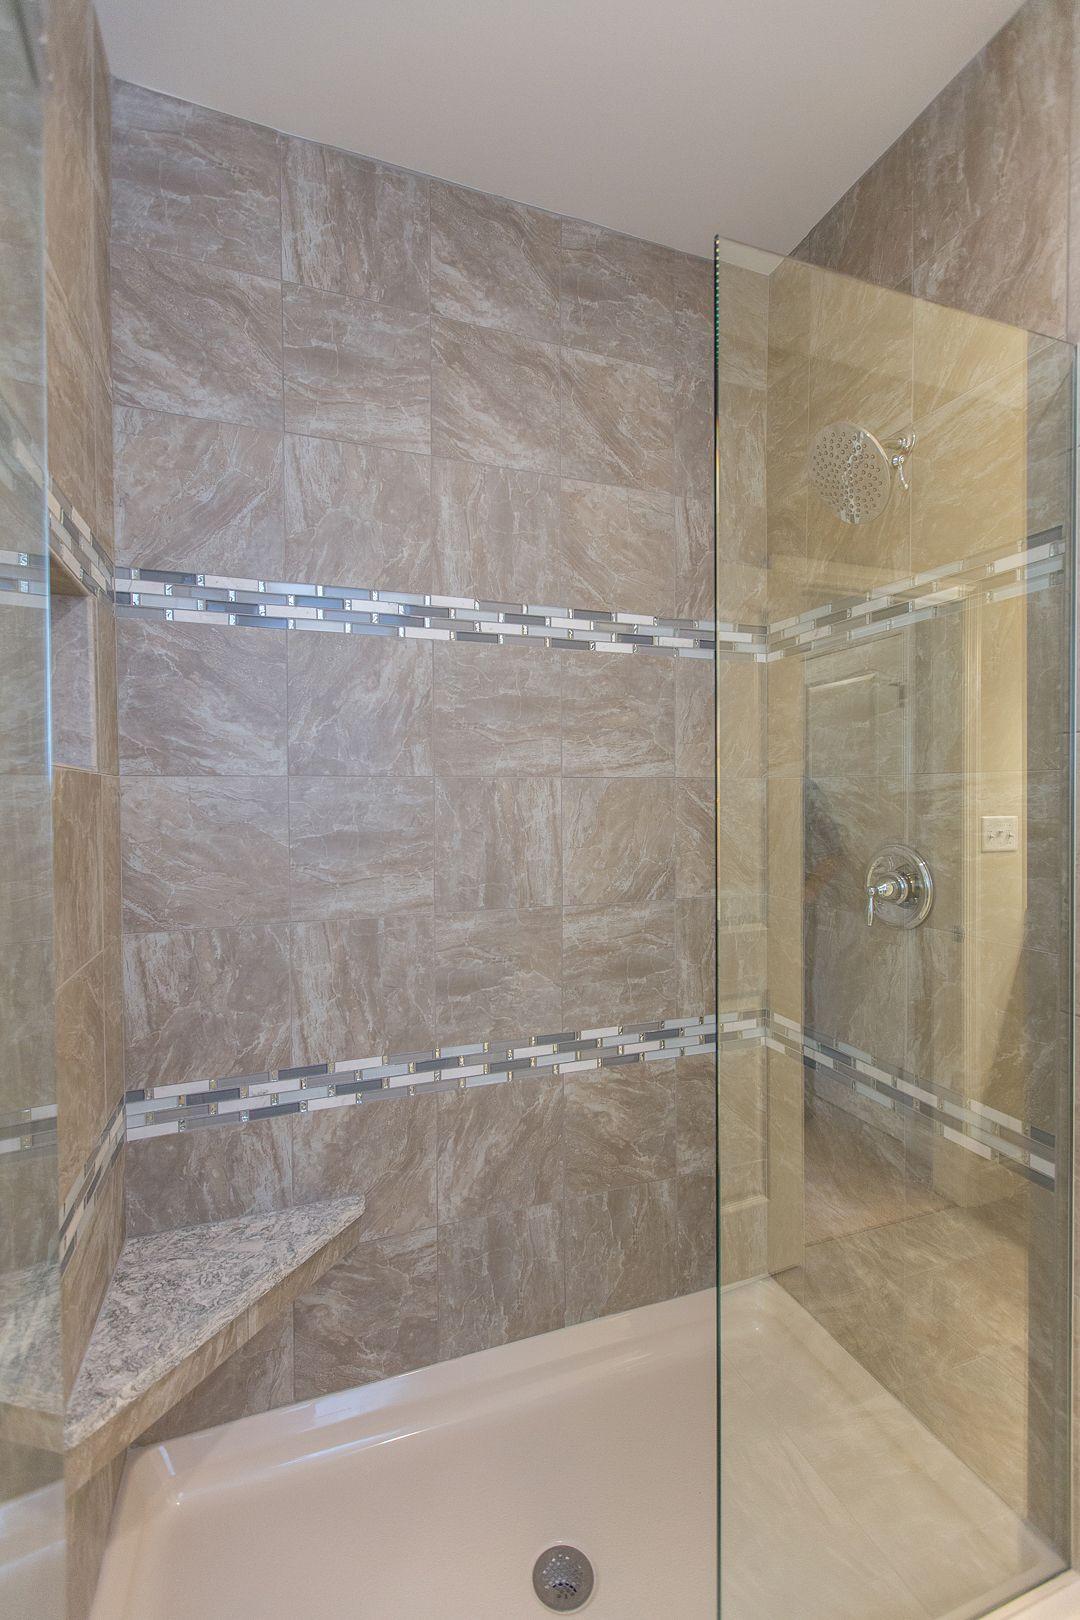 Fiberglass Shower Base Tiled Walls And A Quartz Capped Seat Make